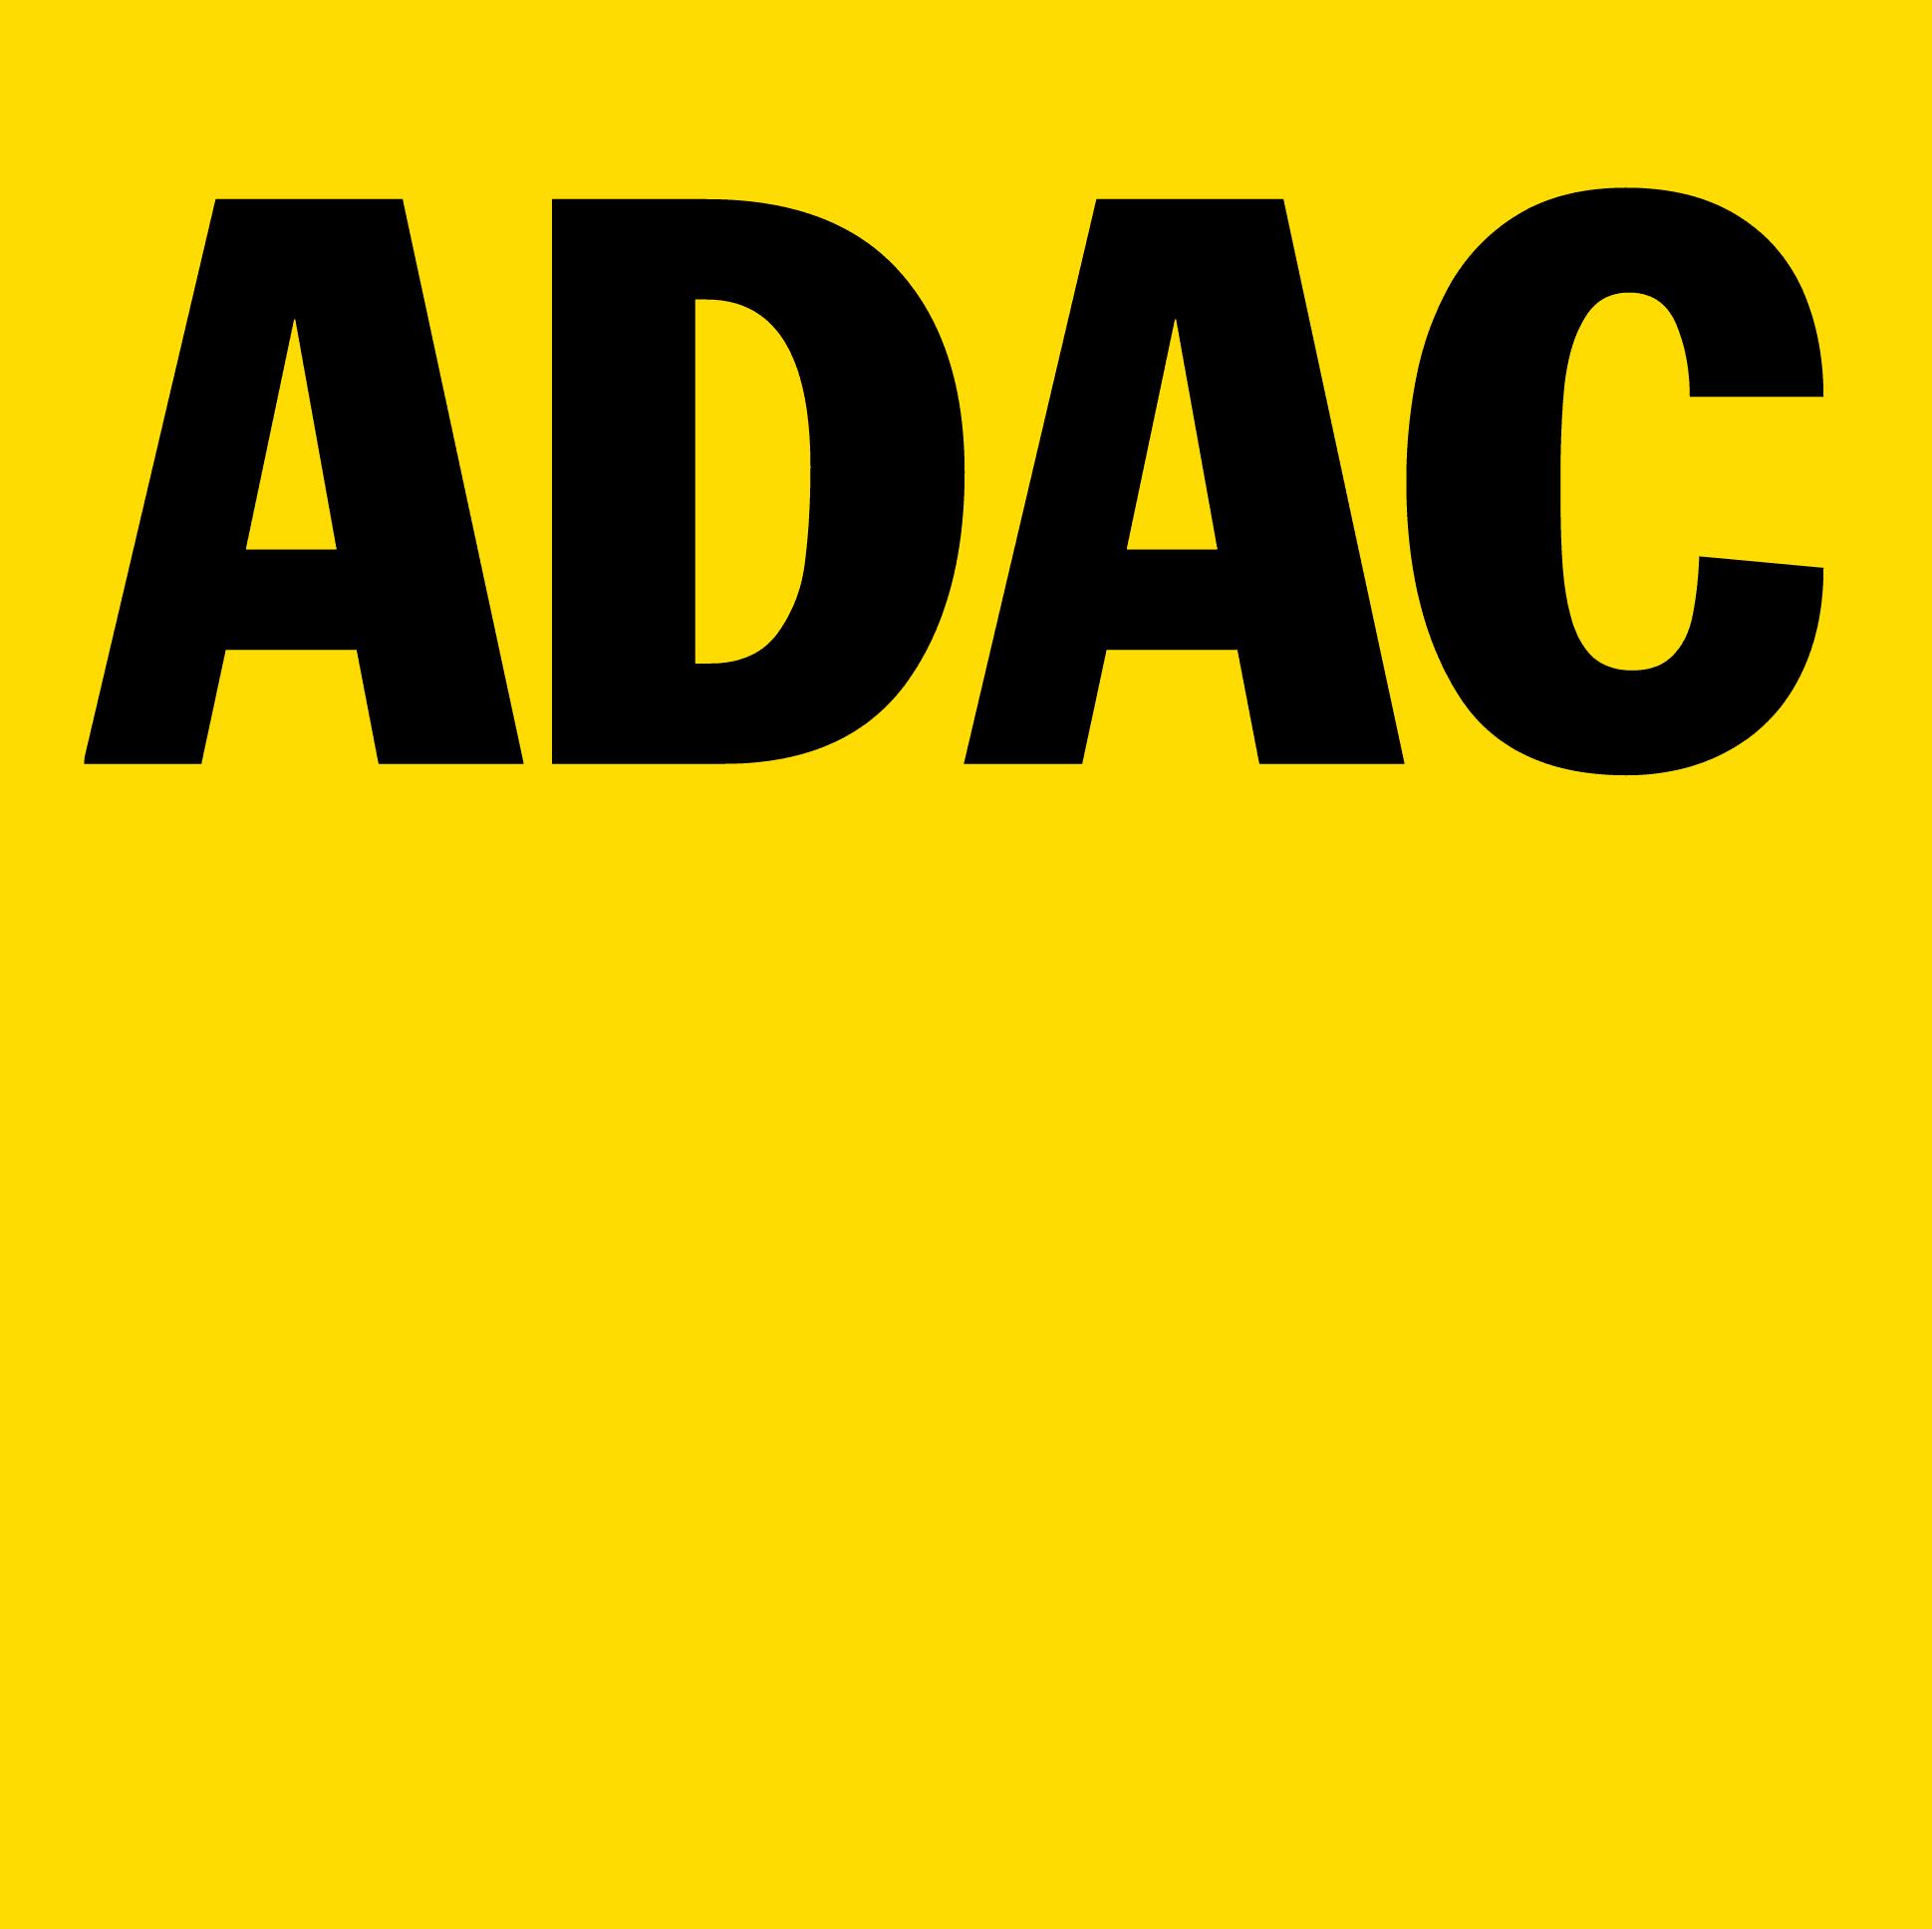 ADAC Logo Vector EPS Free Download, Logo, Icons, Brand Emblems